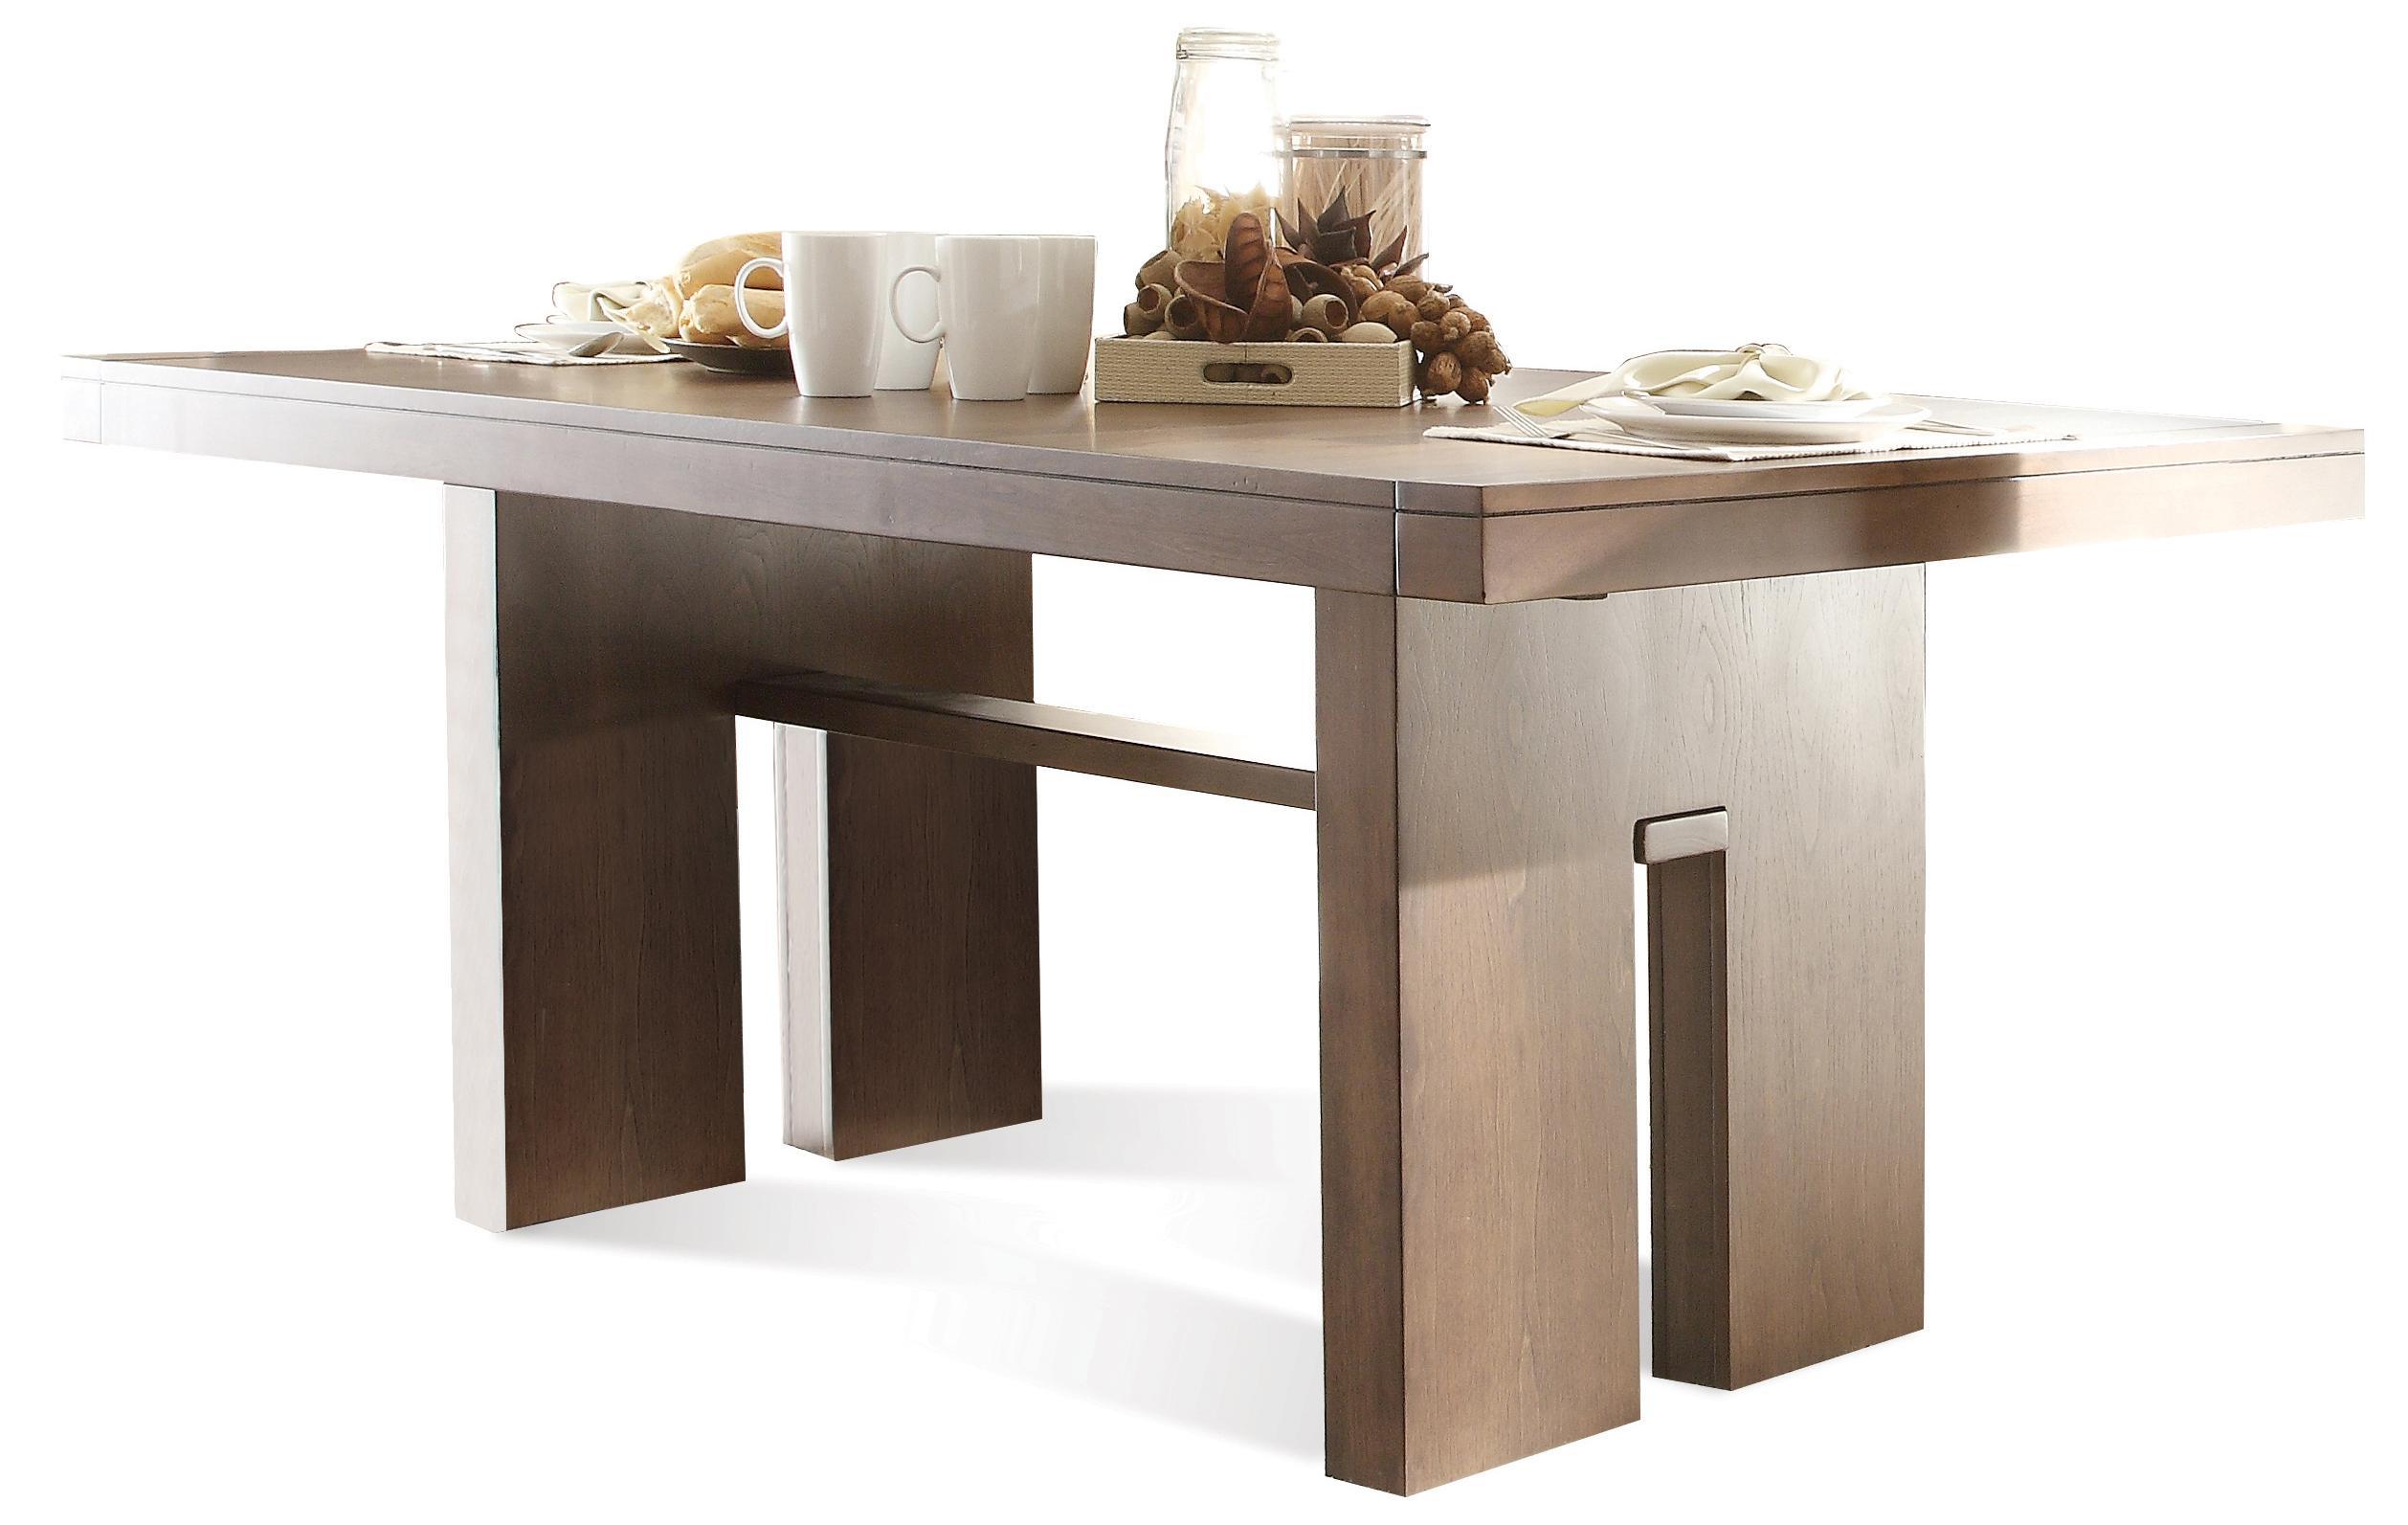 Riverside Furniture Terra Vista Dining Table   Item Number: 98850+51